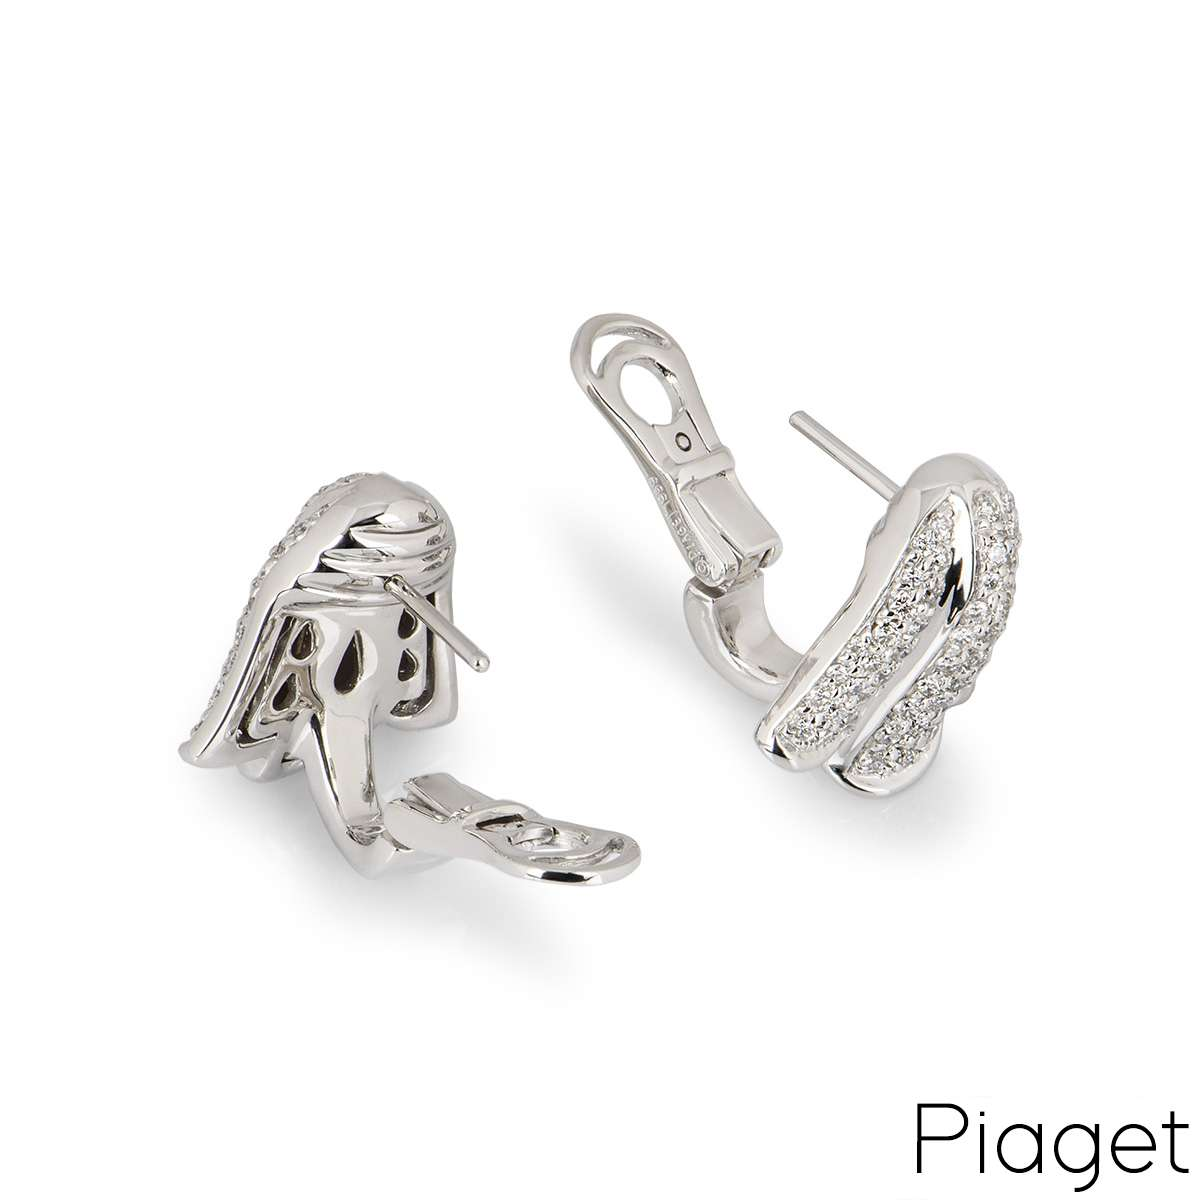 Piaget White Gold Tulip Earring & Pendant Suite